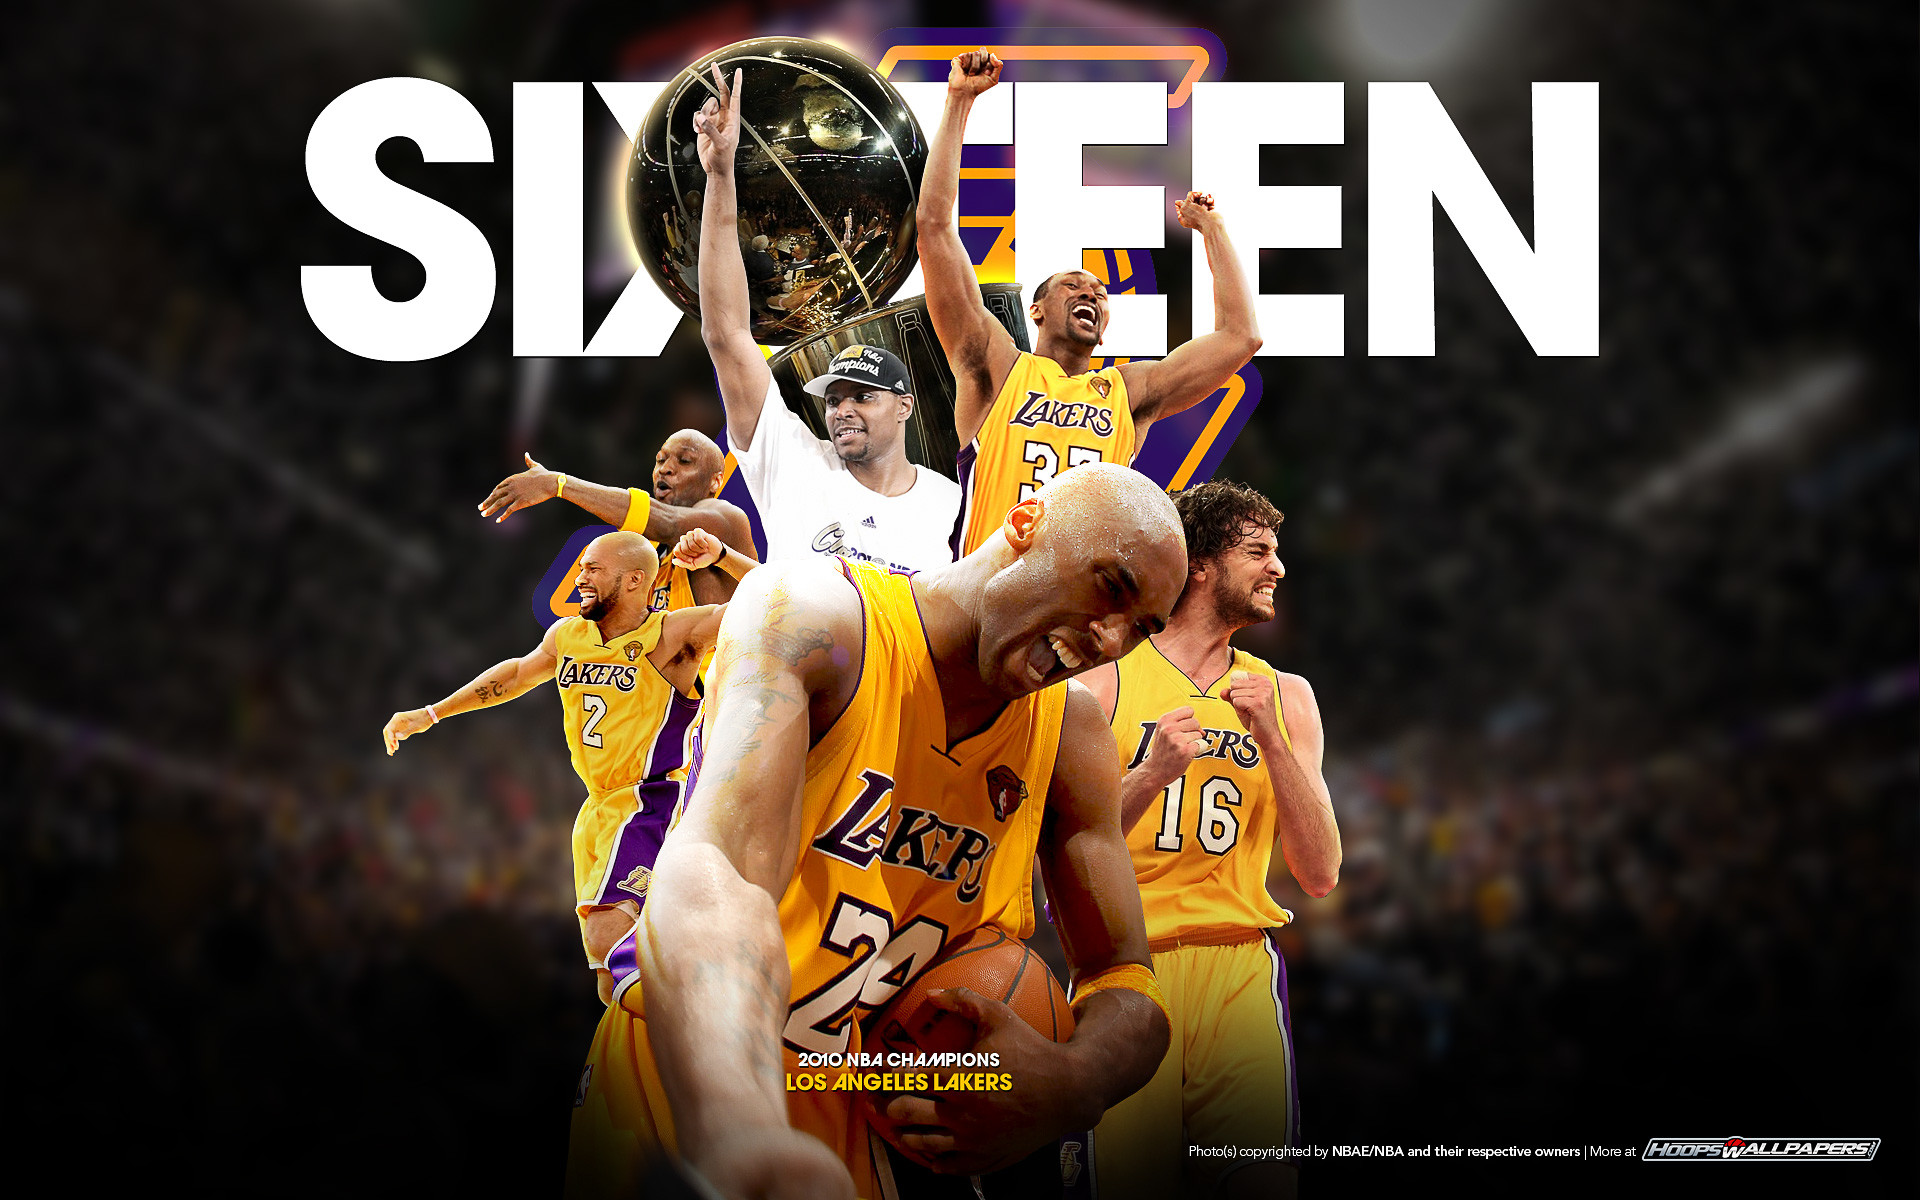 L A Lakers Wallpaper For IPhone #15298 Wallpaper   Wallpaper …   Los  Angeles Clippers Los Angeles Lakers   Pinterest   Lakers wallpaper